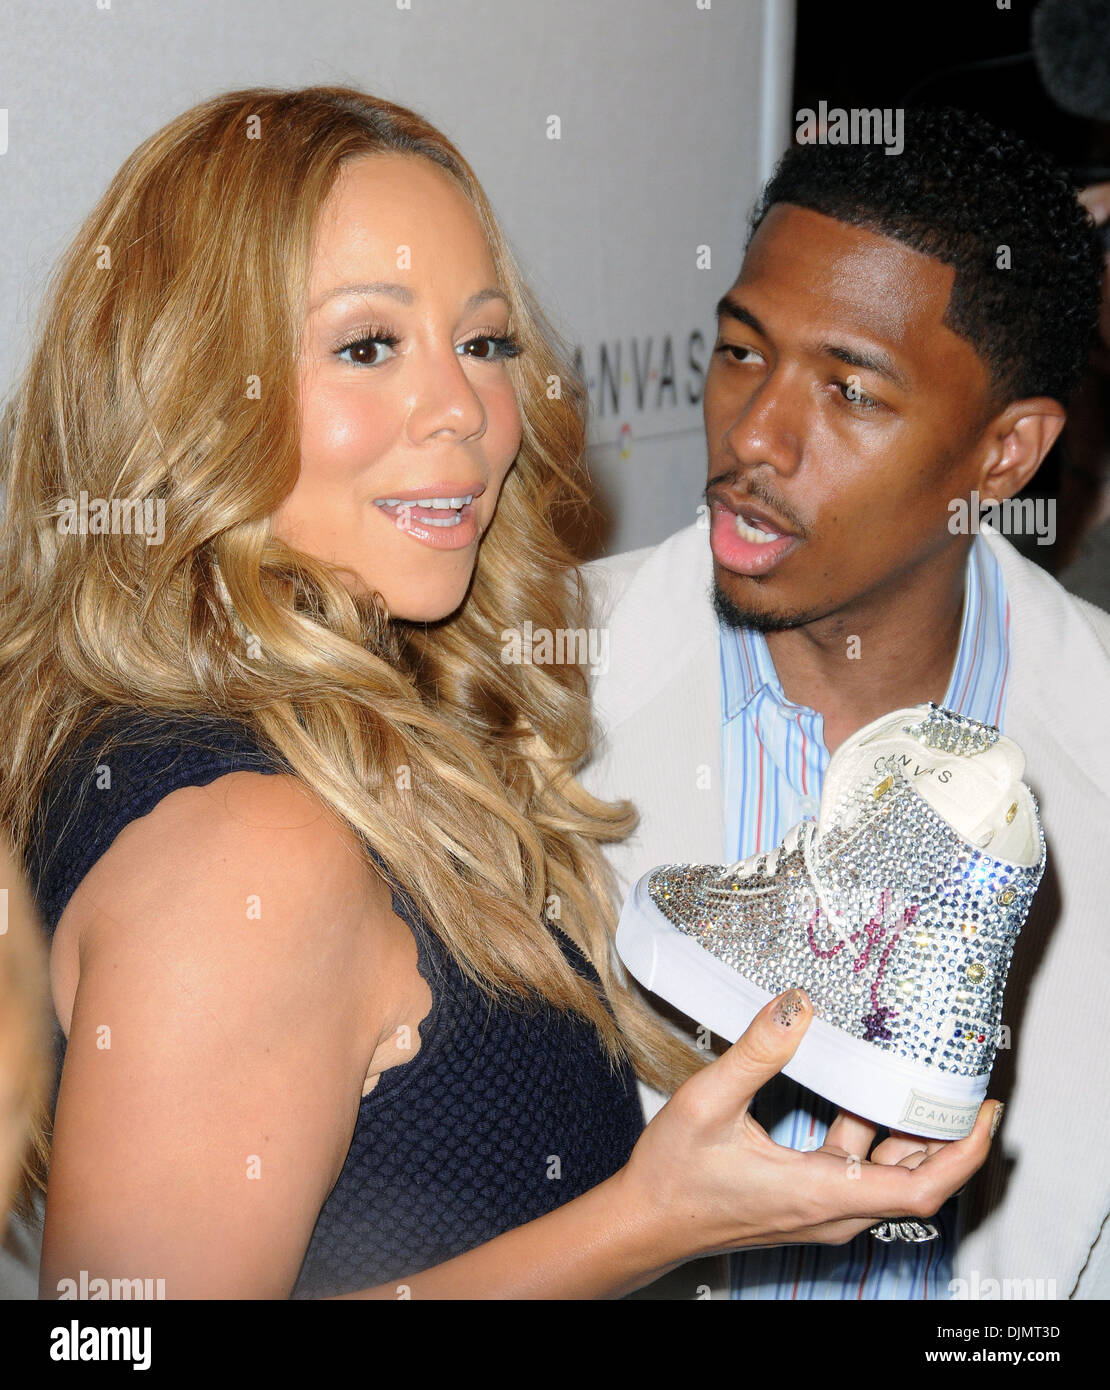 Mariah Carey und Ehemann Nick Cannon Projekt Leinwand Kunst Gala - Ankünfte Featuring: Mariah Carey und Ehemann Stockfoto